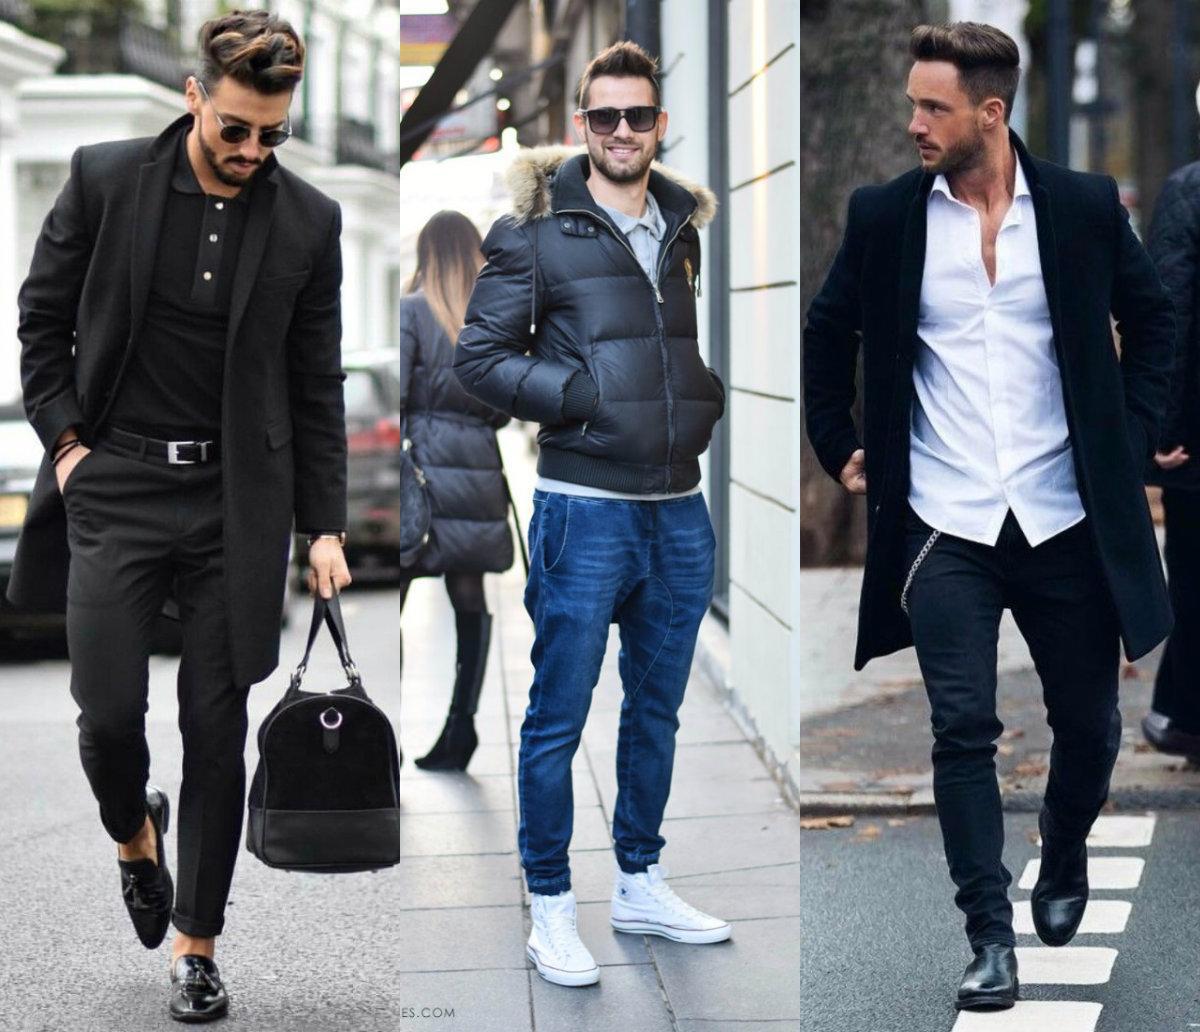 Мужская мода 2019 : луки на холодное время года